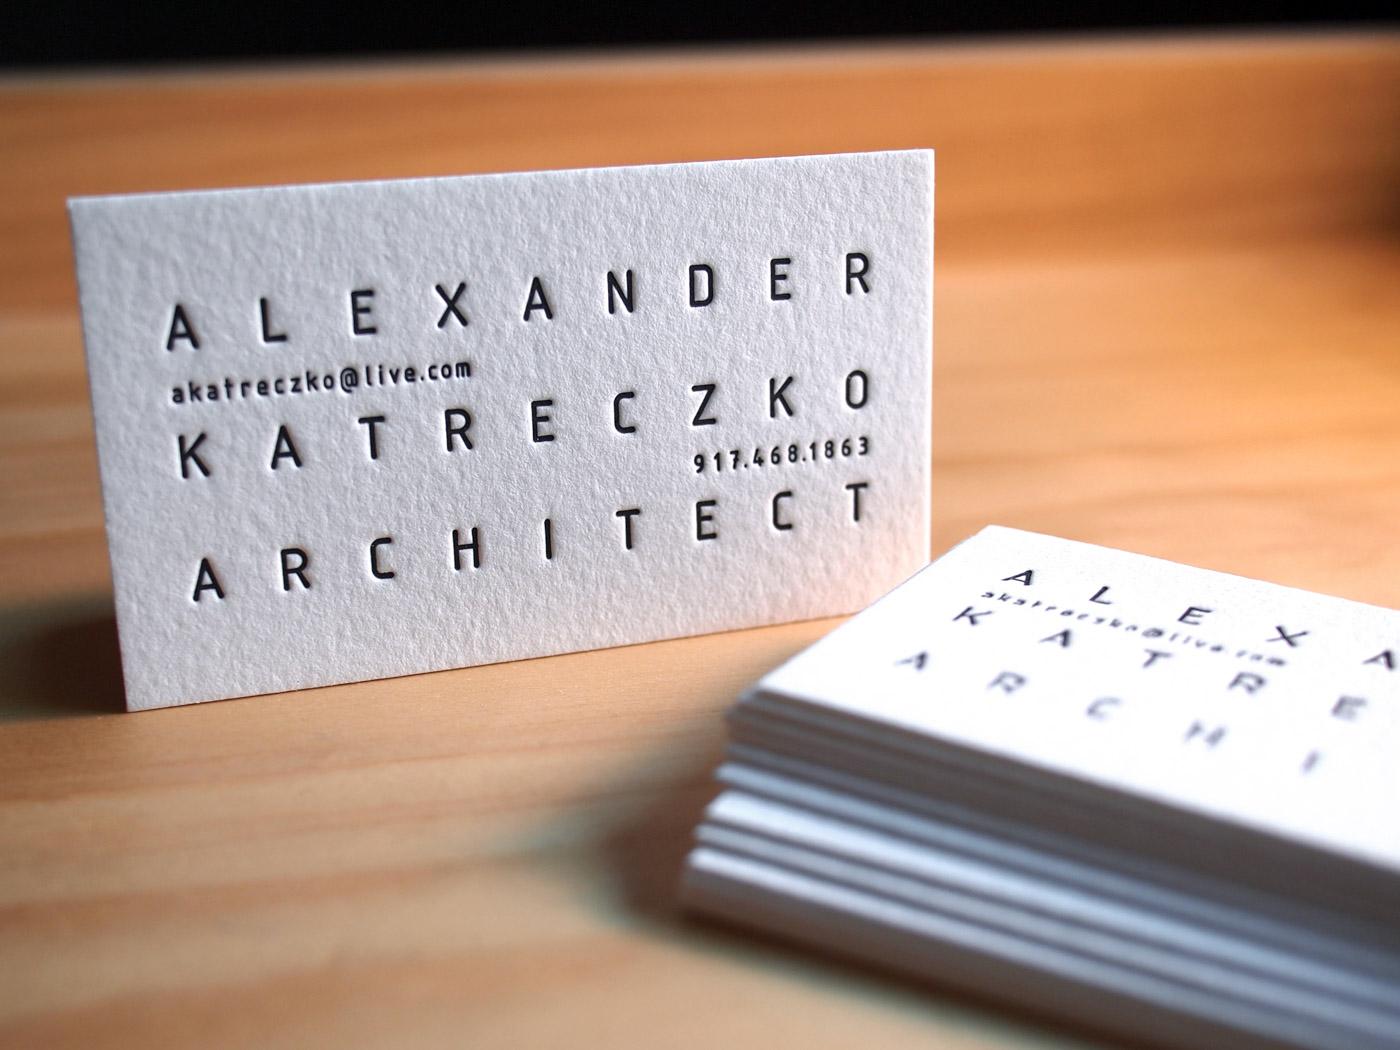 Letterpress business card gallery parklife press alexander katreczko colourmoves